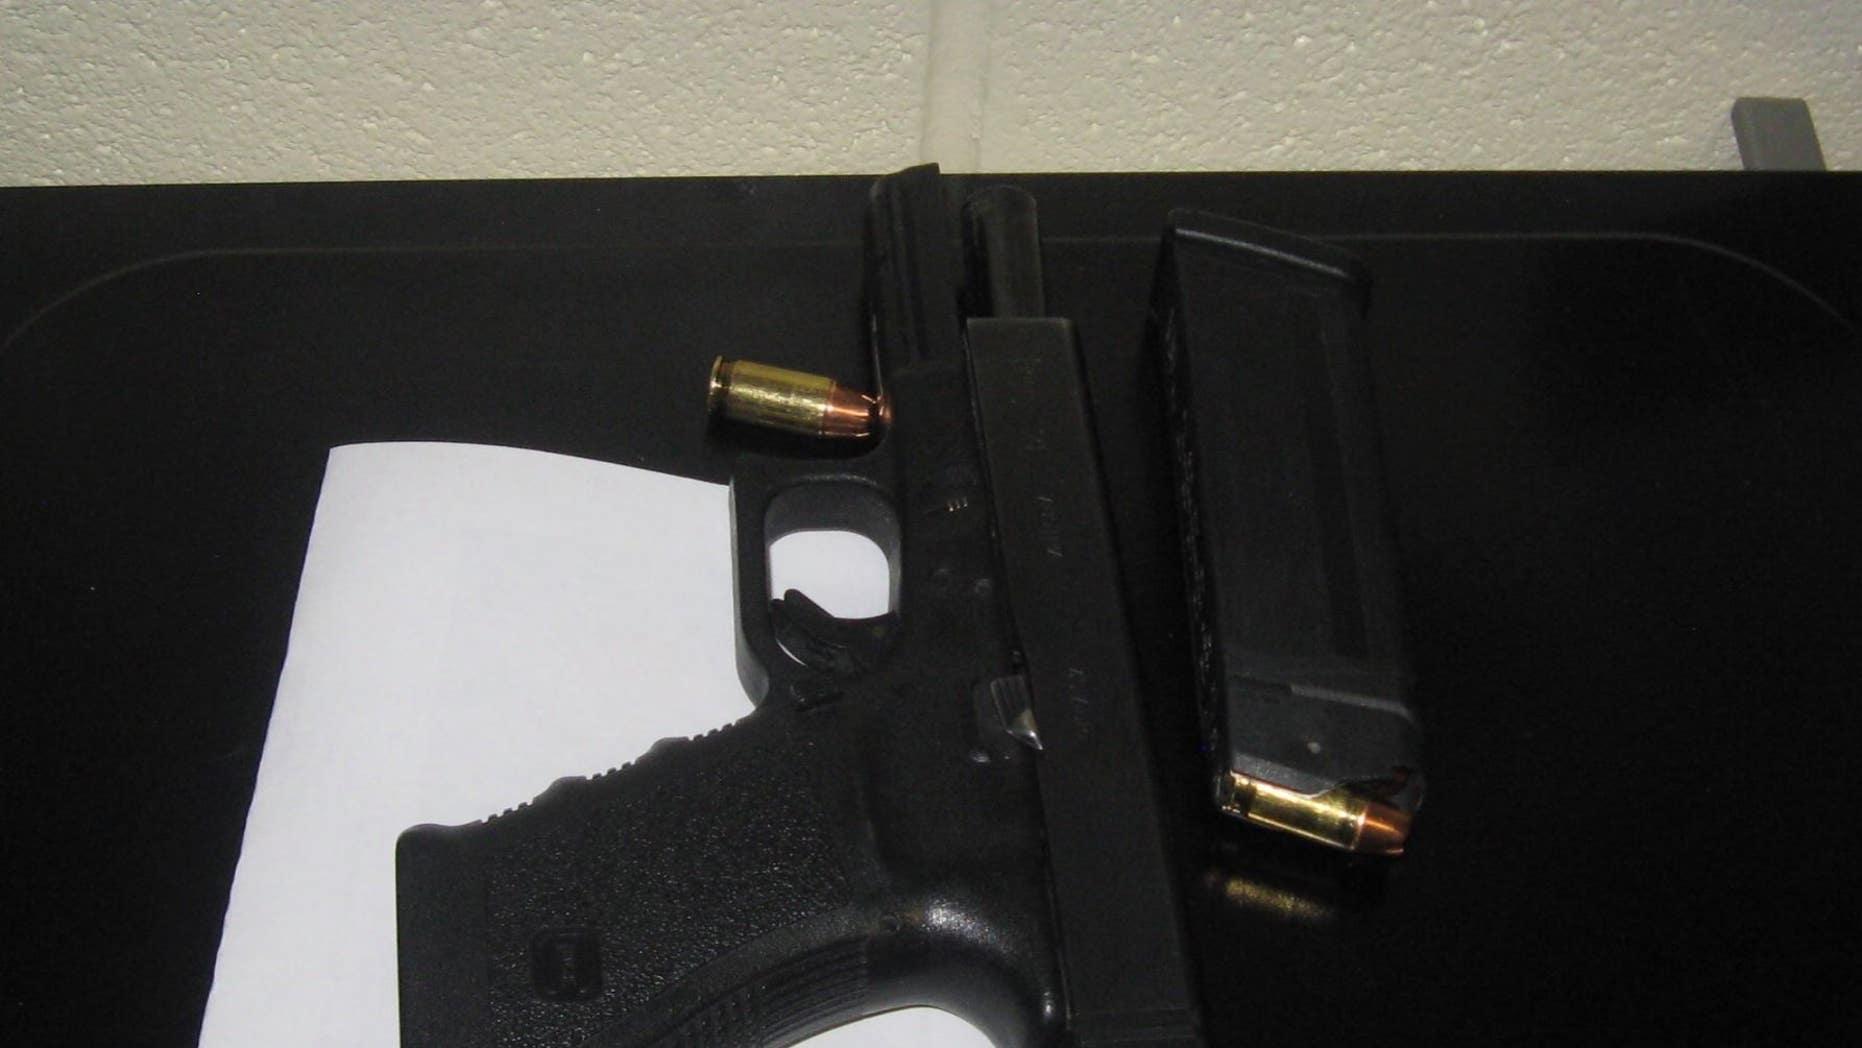 Gun seized from 6-year-old kindergartner walking into school